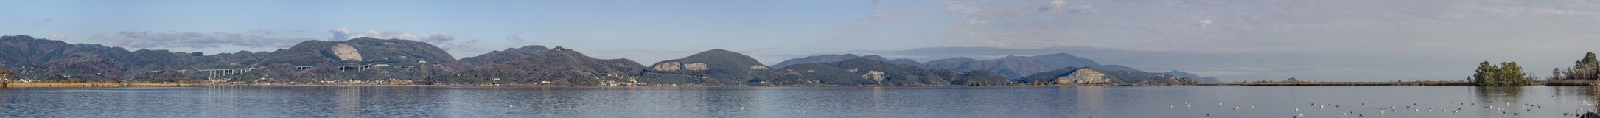 Vista panorâmica do lago Massaciuccoli de Torre del Lago Puccini, Lucca, Toscânia, Itália Imagens de Stock